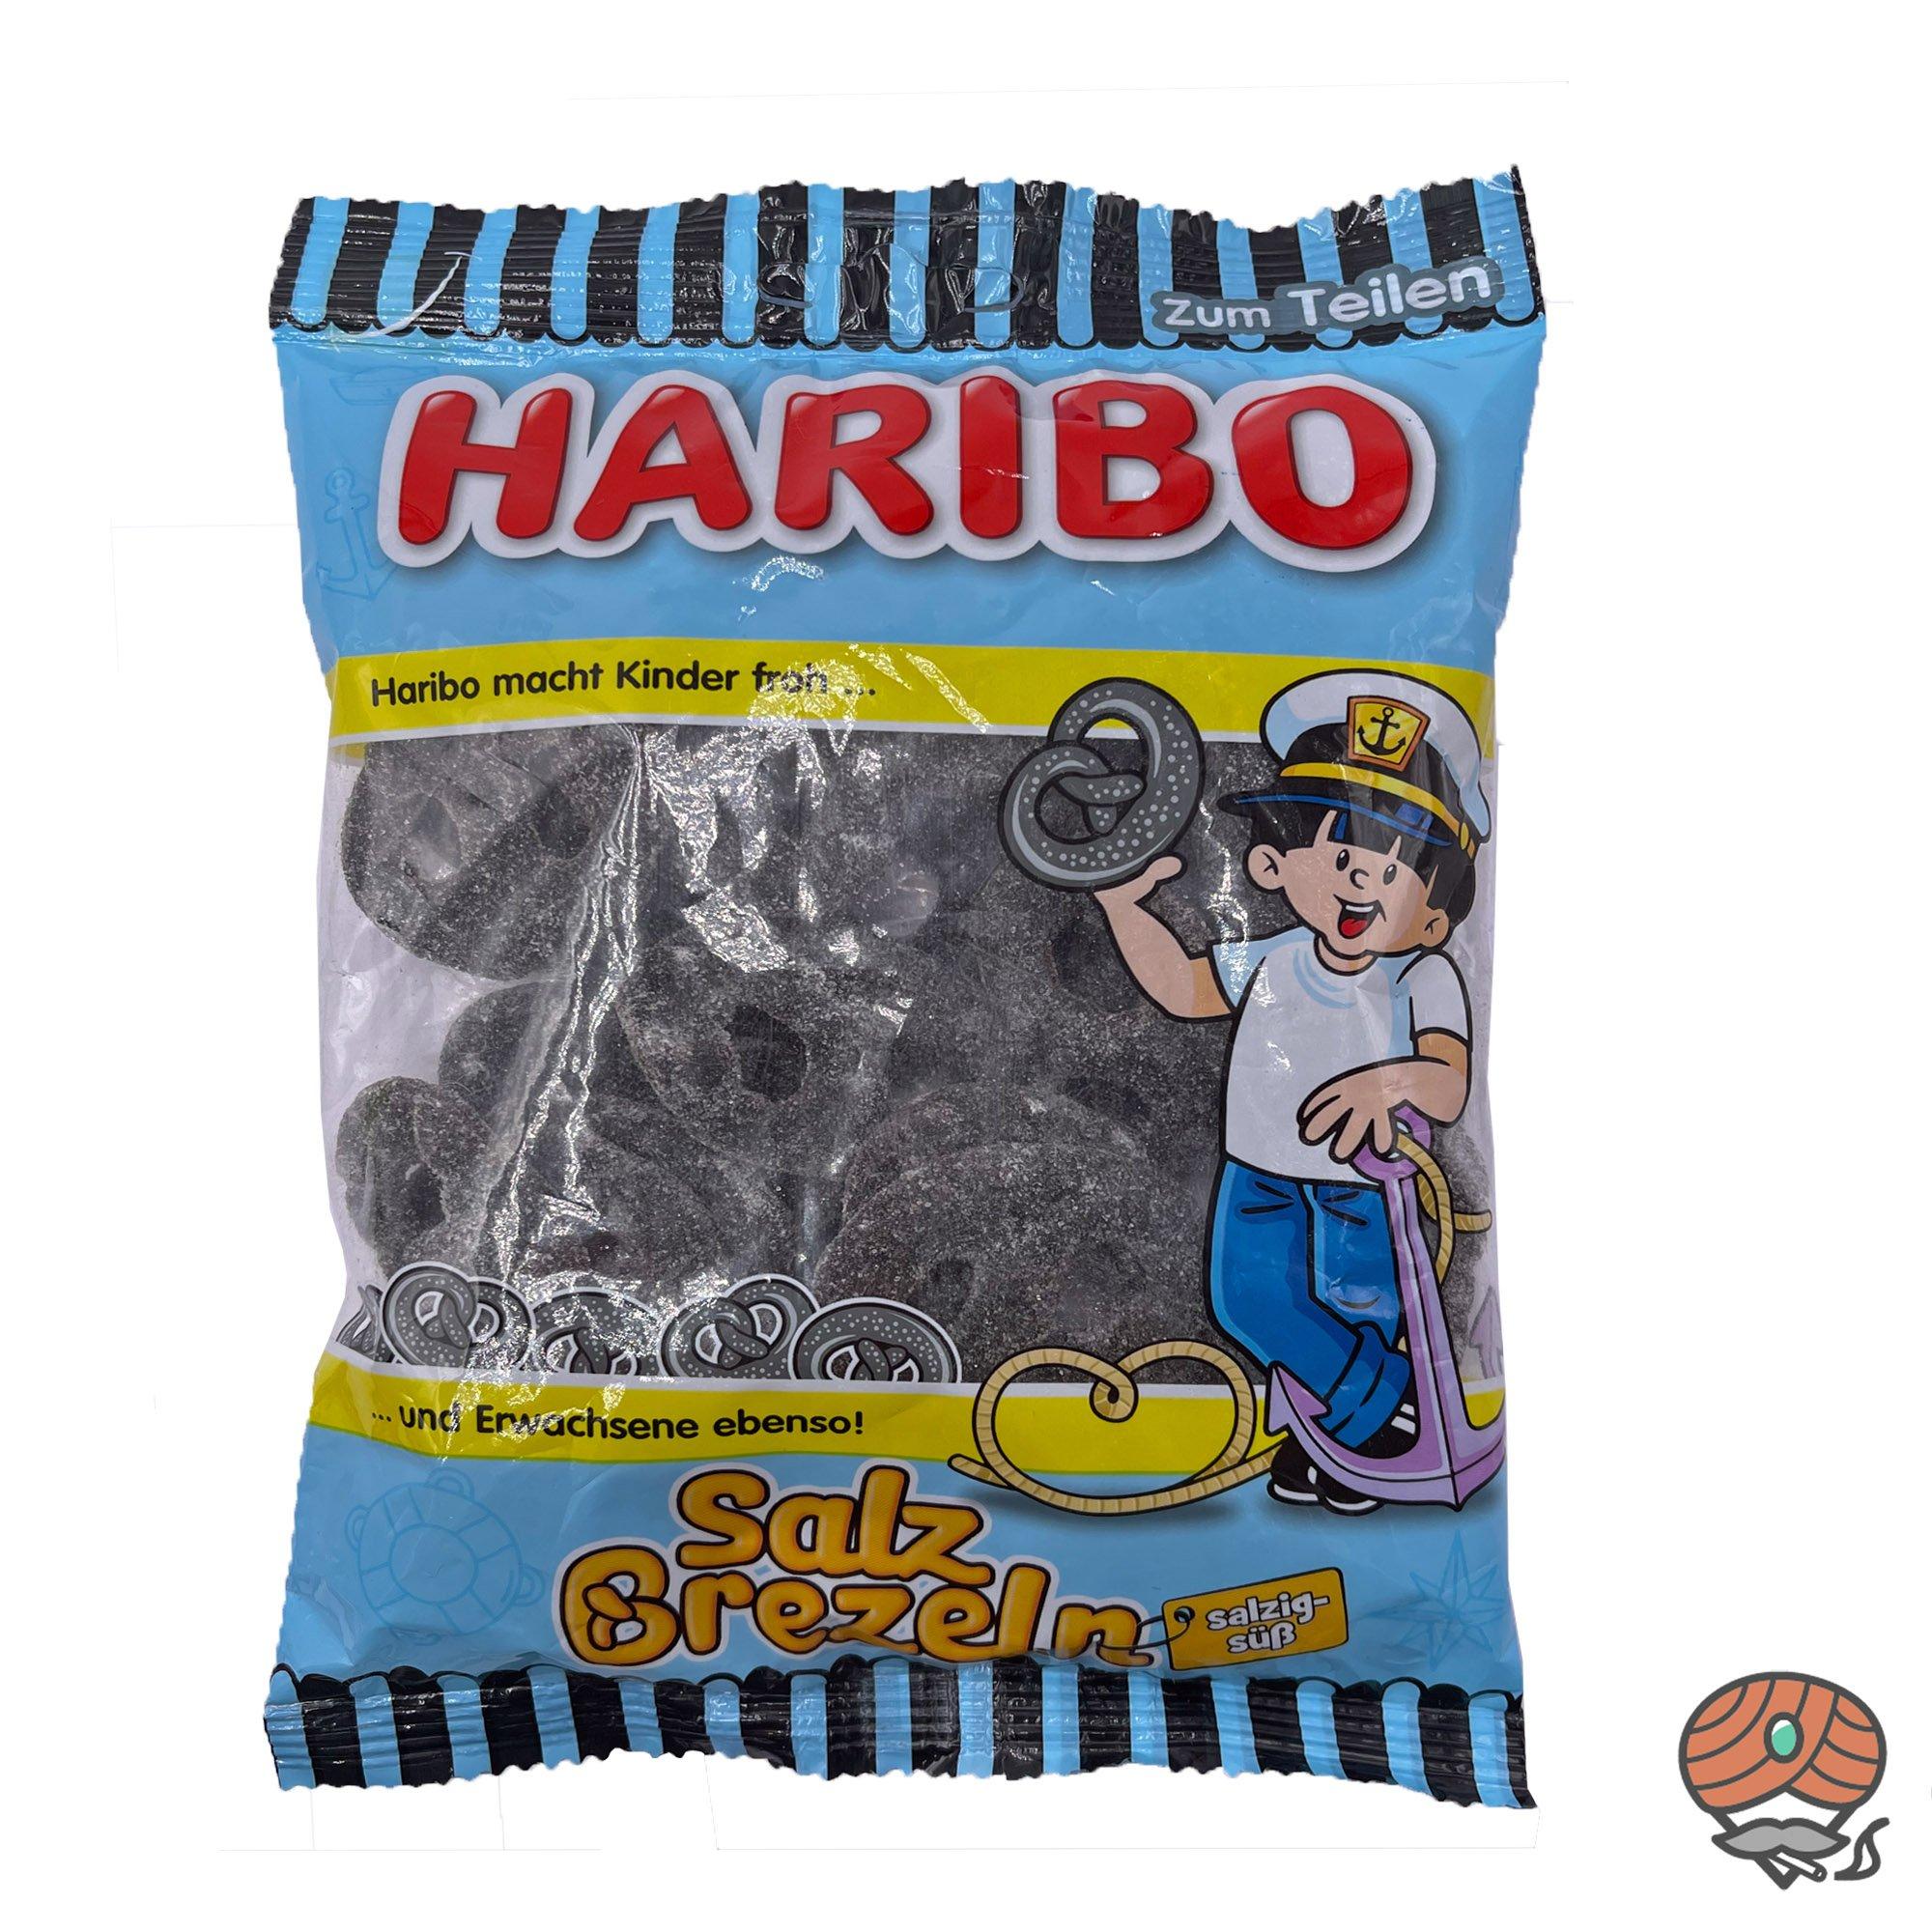 Haribo Salz Brezeln (salzig-süß) 200g